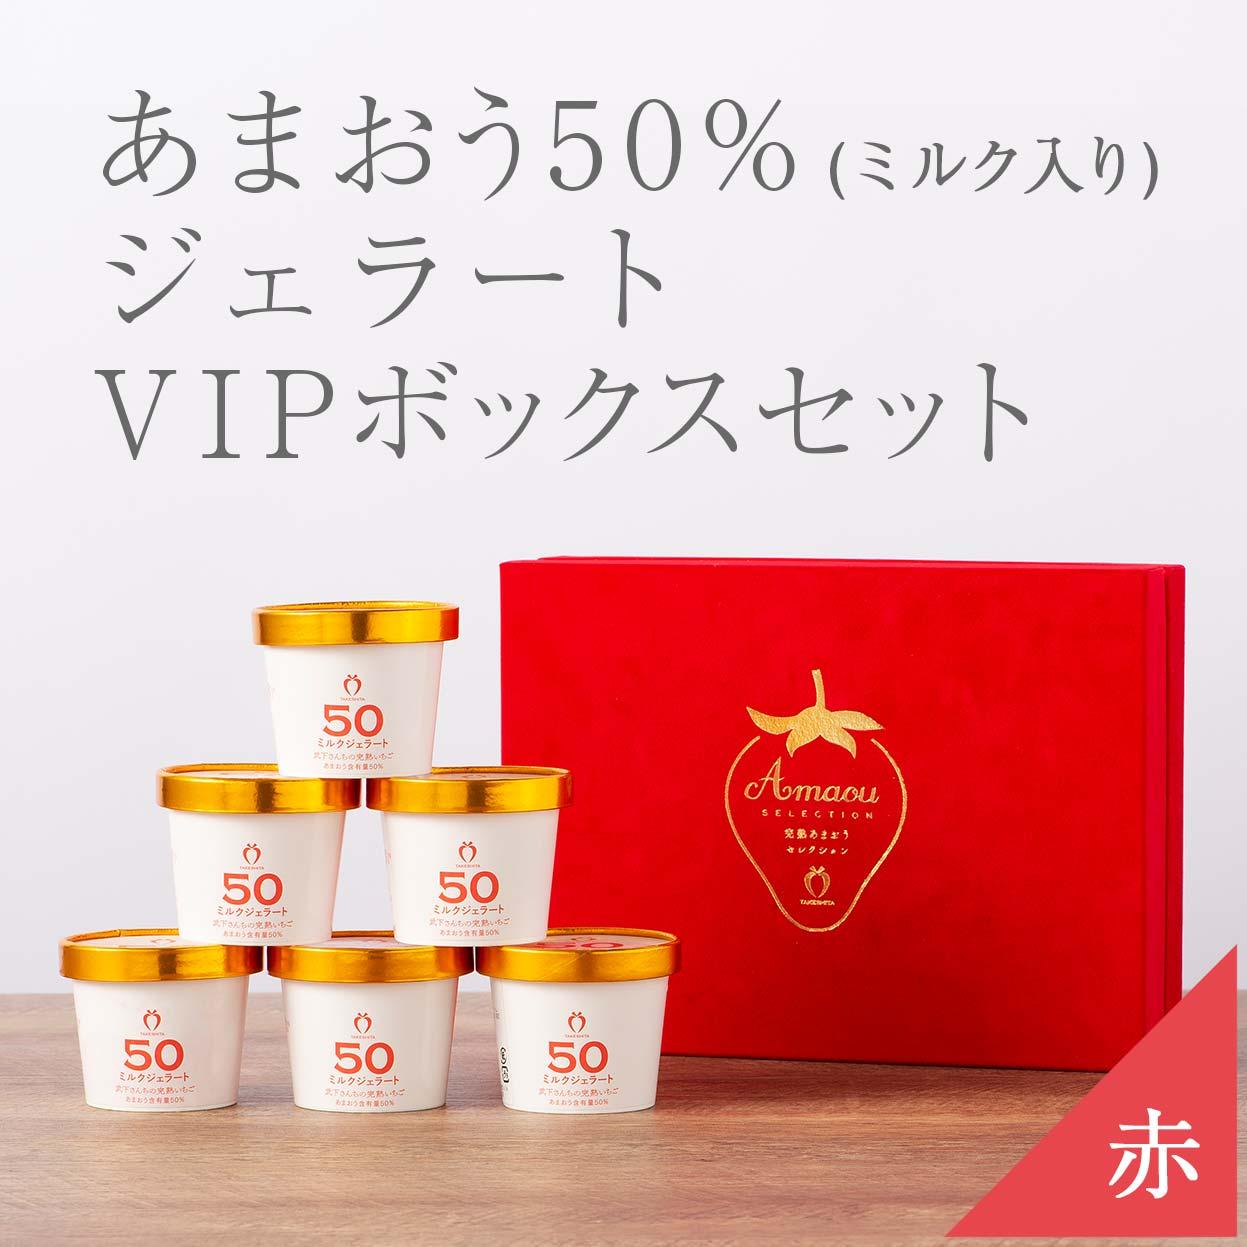 VIPボックス赤 完熟あまおう50%ミルクジェラートセット 6個入り